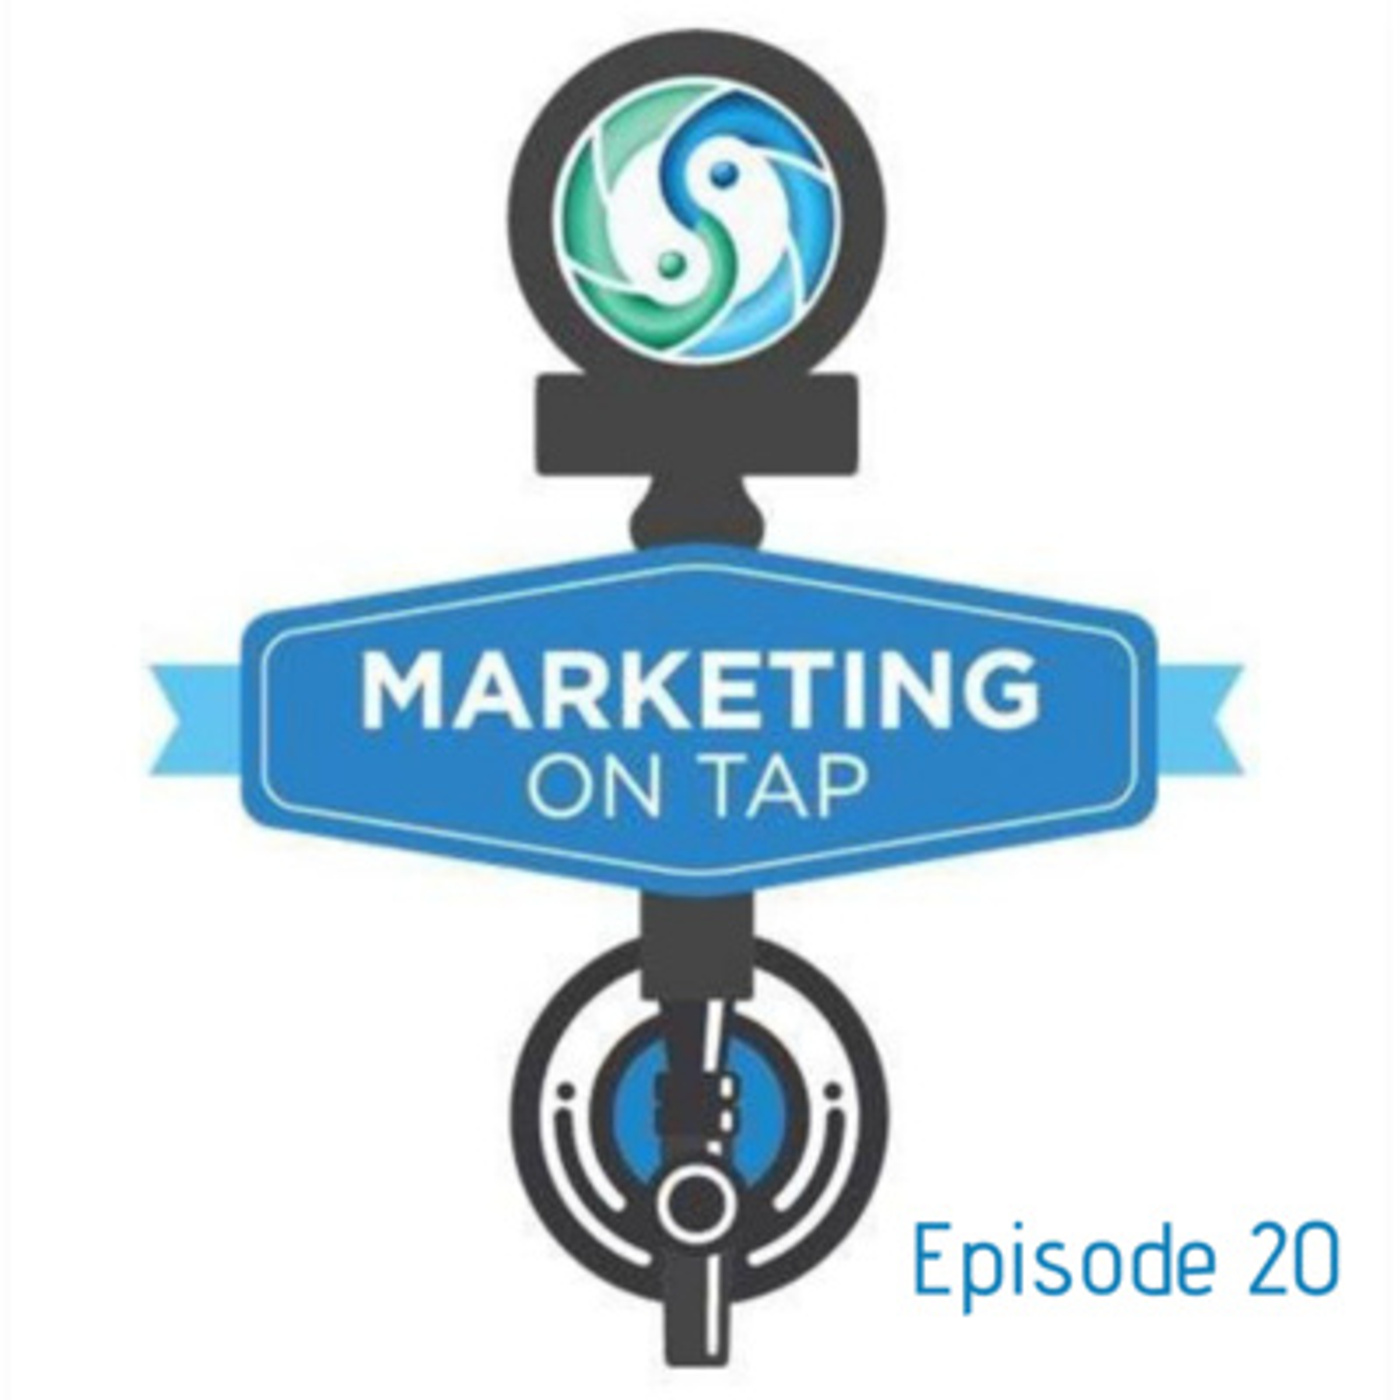 Episode 20: Ice Cream, Startup Disruptors, & Big Corporations Becoming Nimble